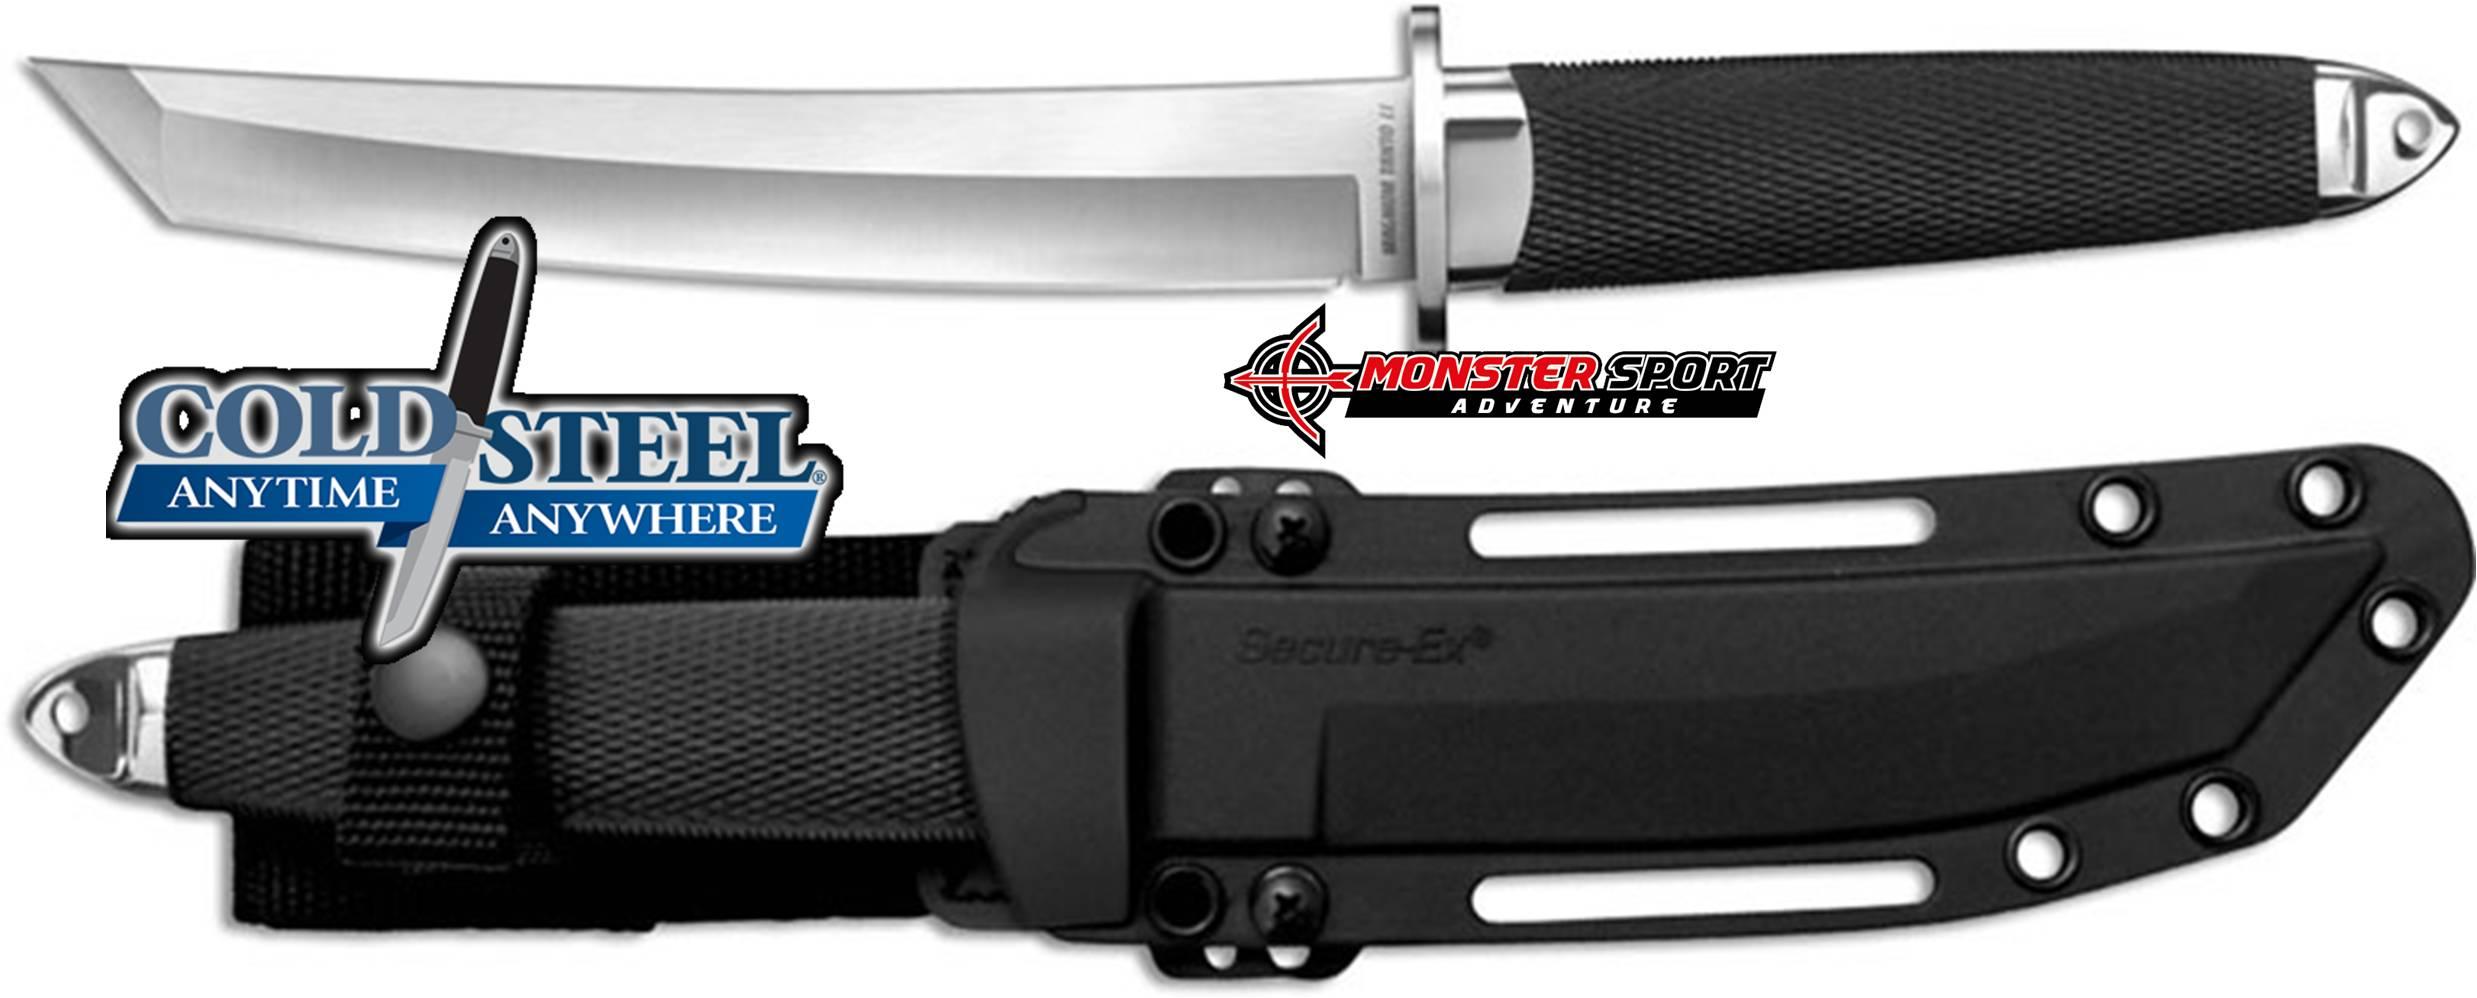 Cold Steel San Mai Magnum Tanto II Fixed Blade